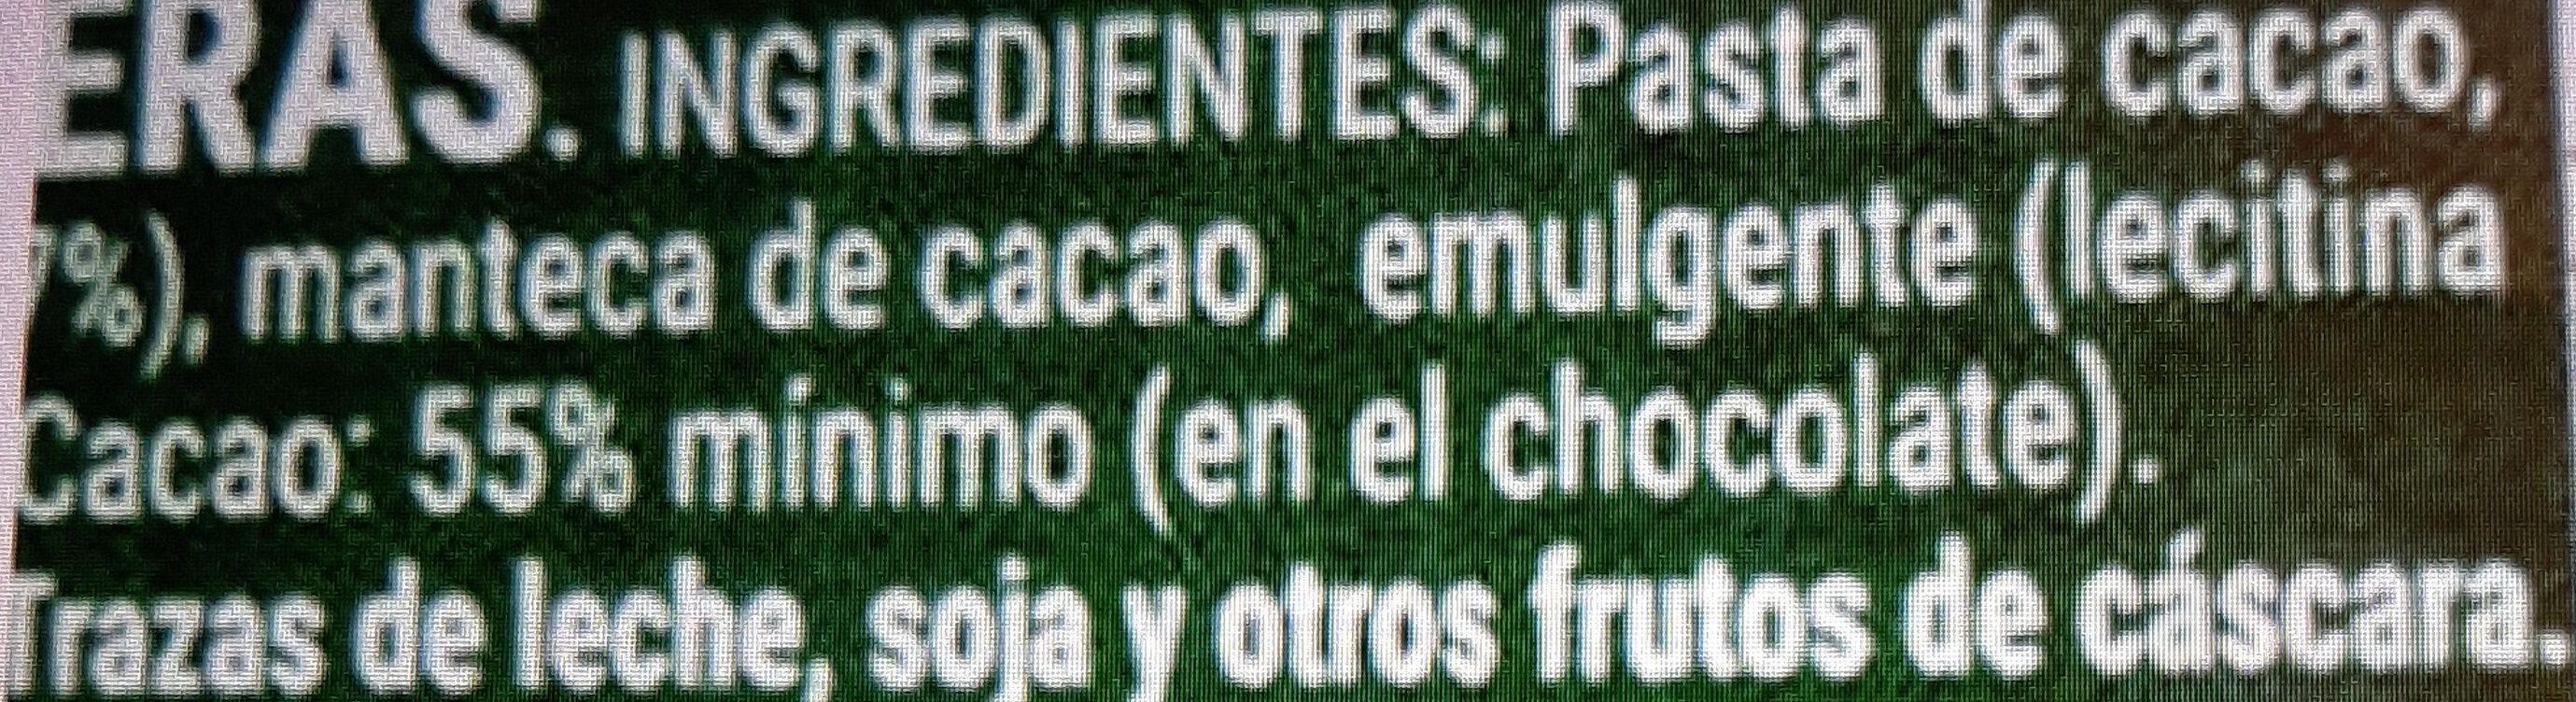 Chocolate extrafino negro avellanas - Ingredientes - es